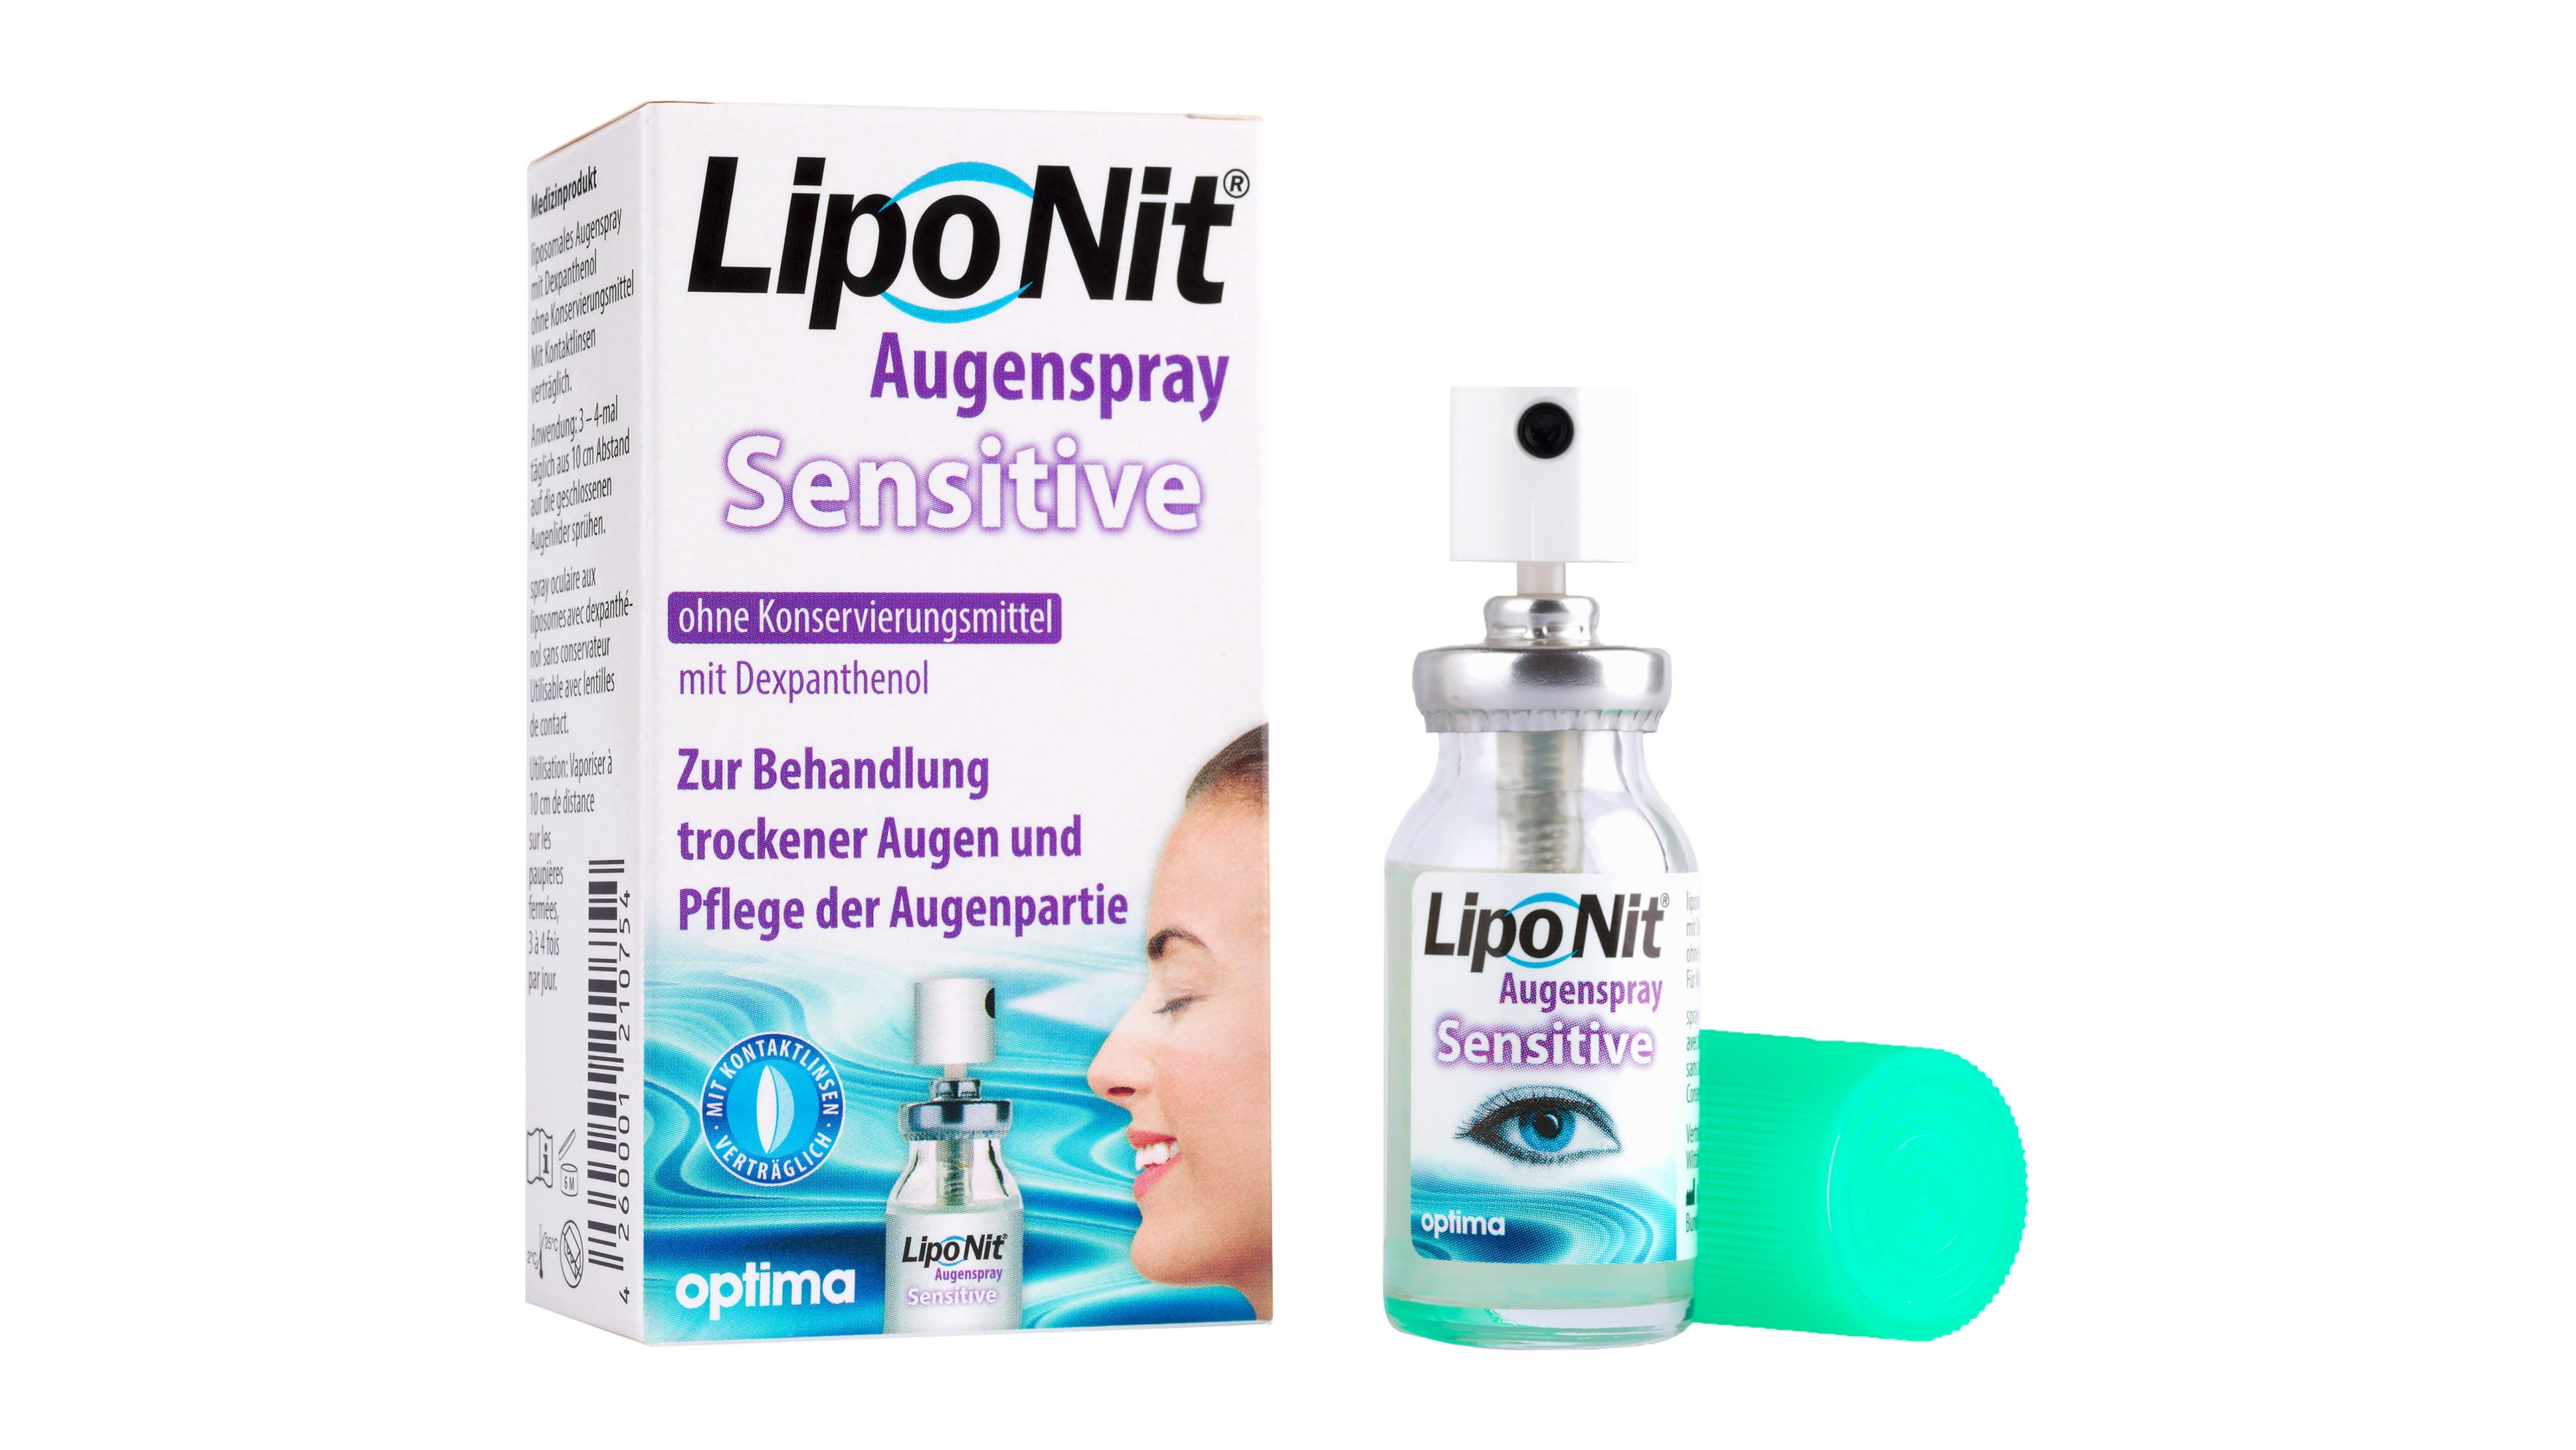 4260001210754_front_liponit_augenspray_sensitiv